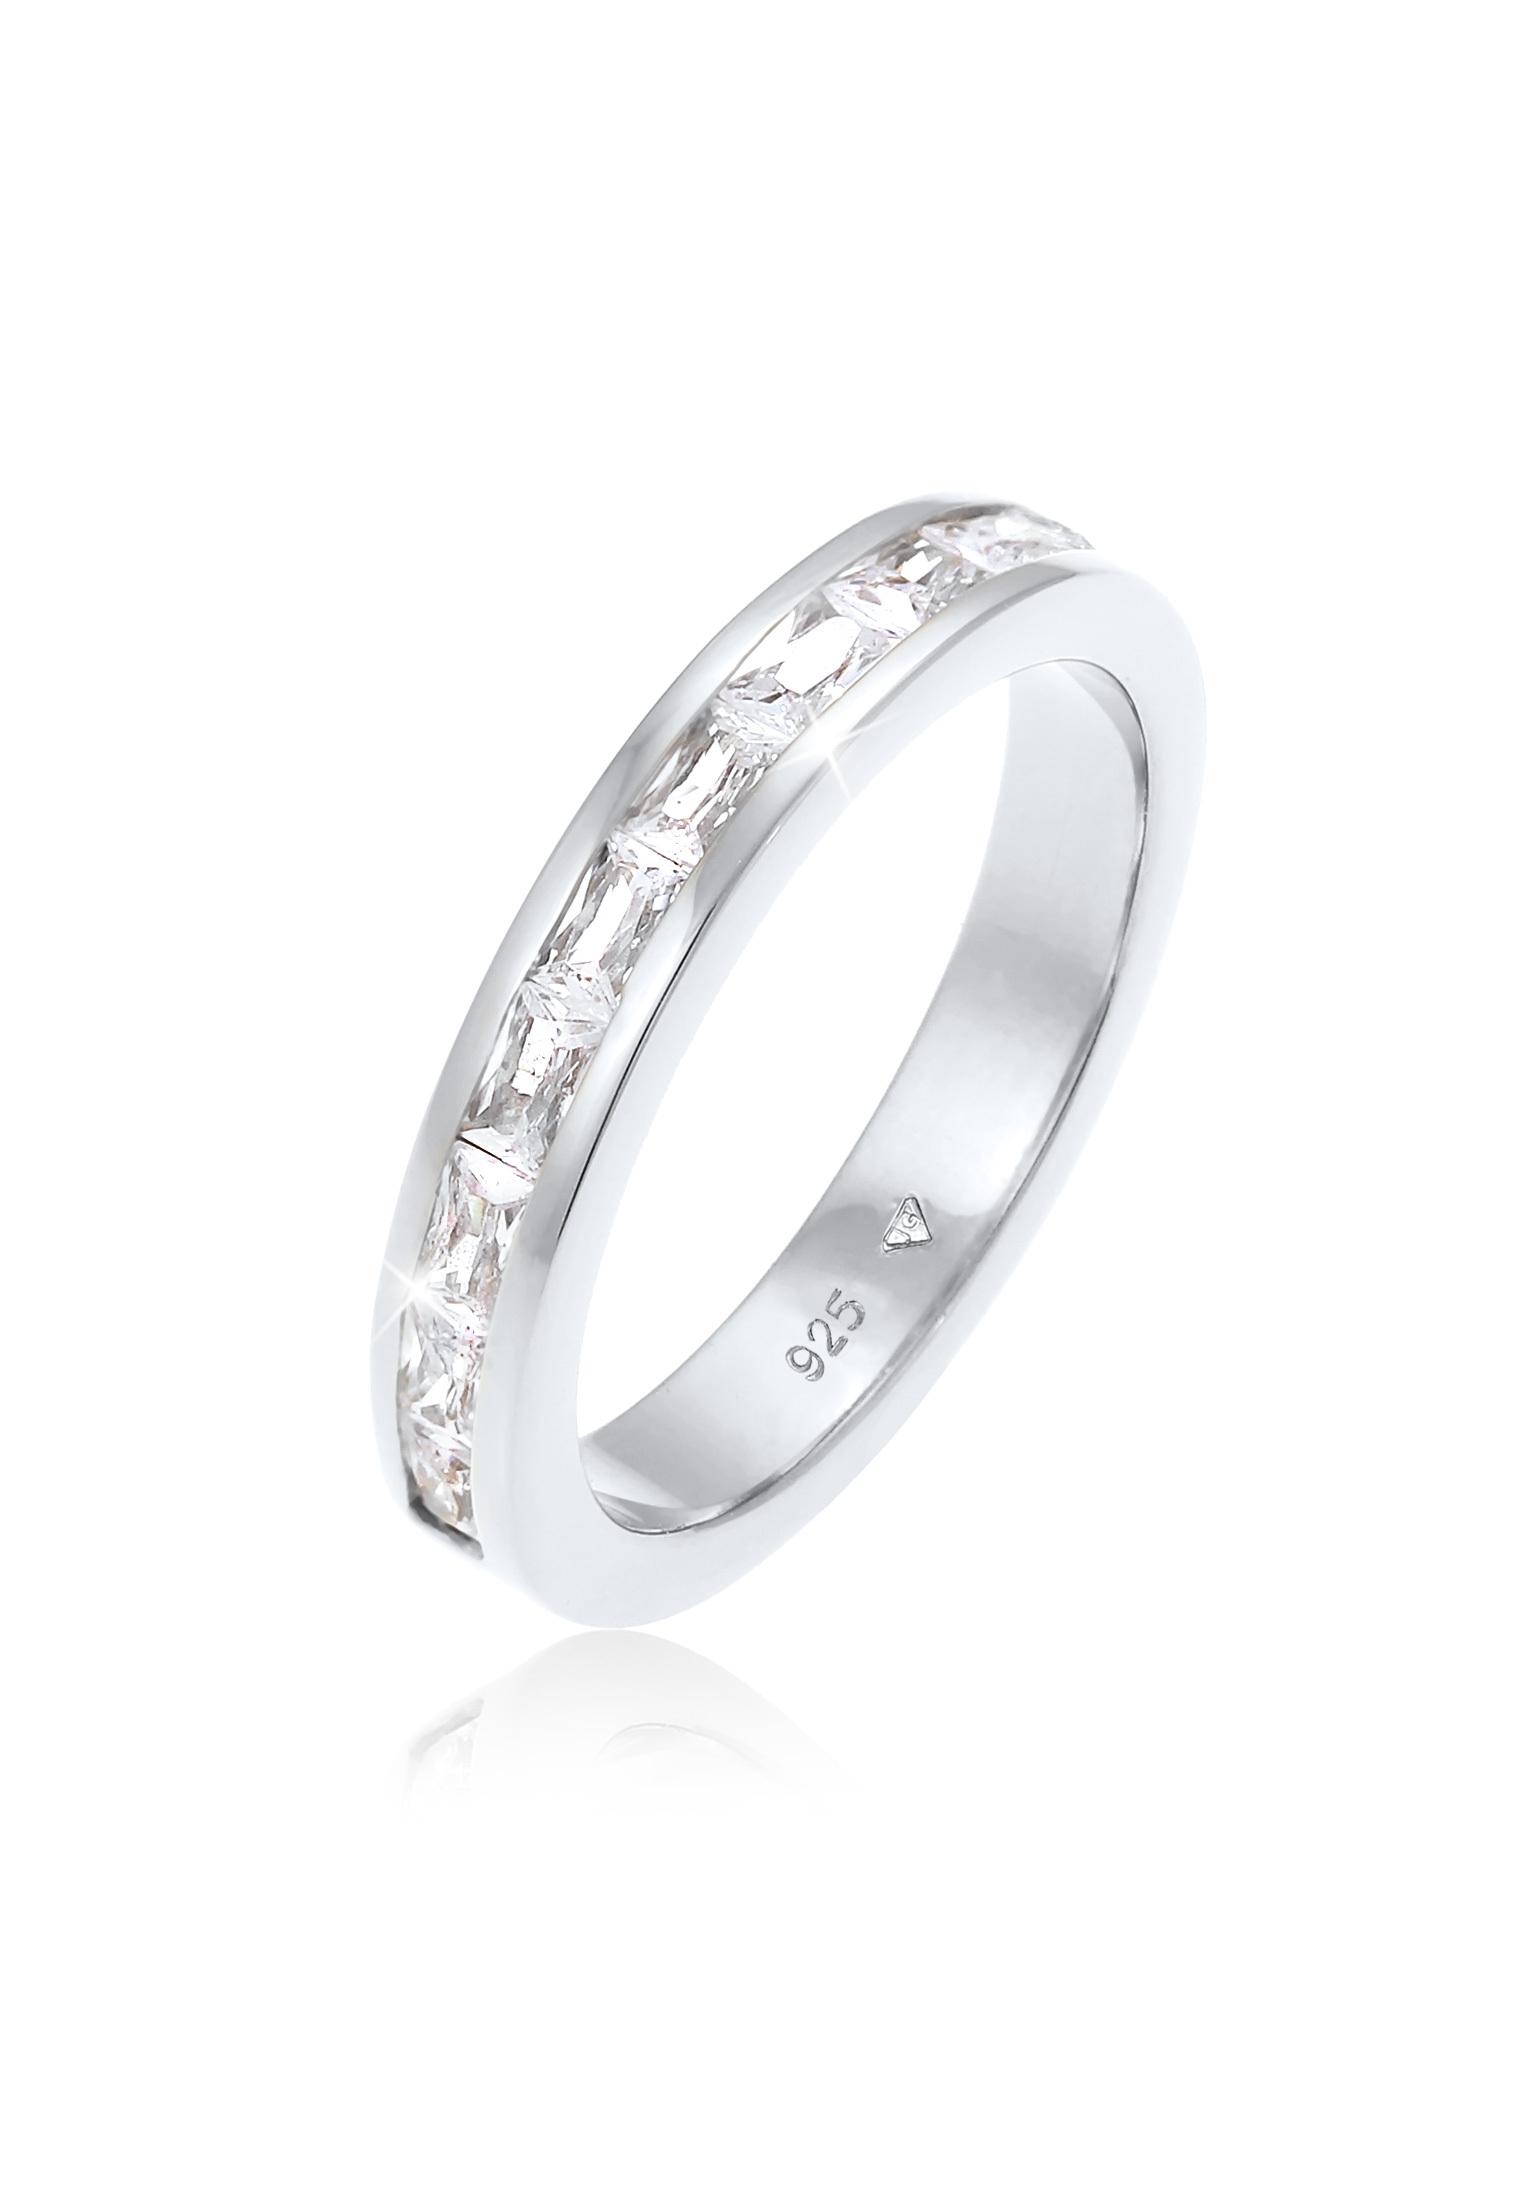 Ring Verlobungsring   Zirkonia ( Weiß )   925er Sterling Silber